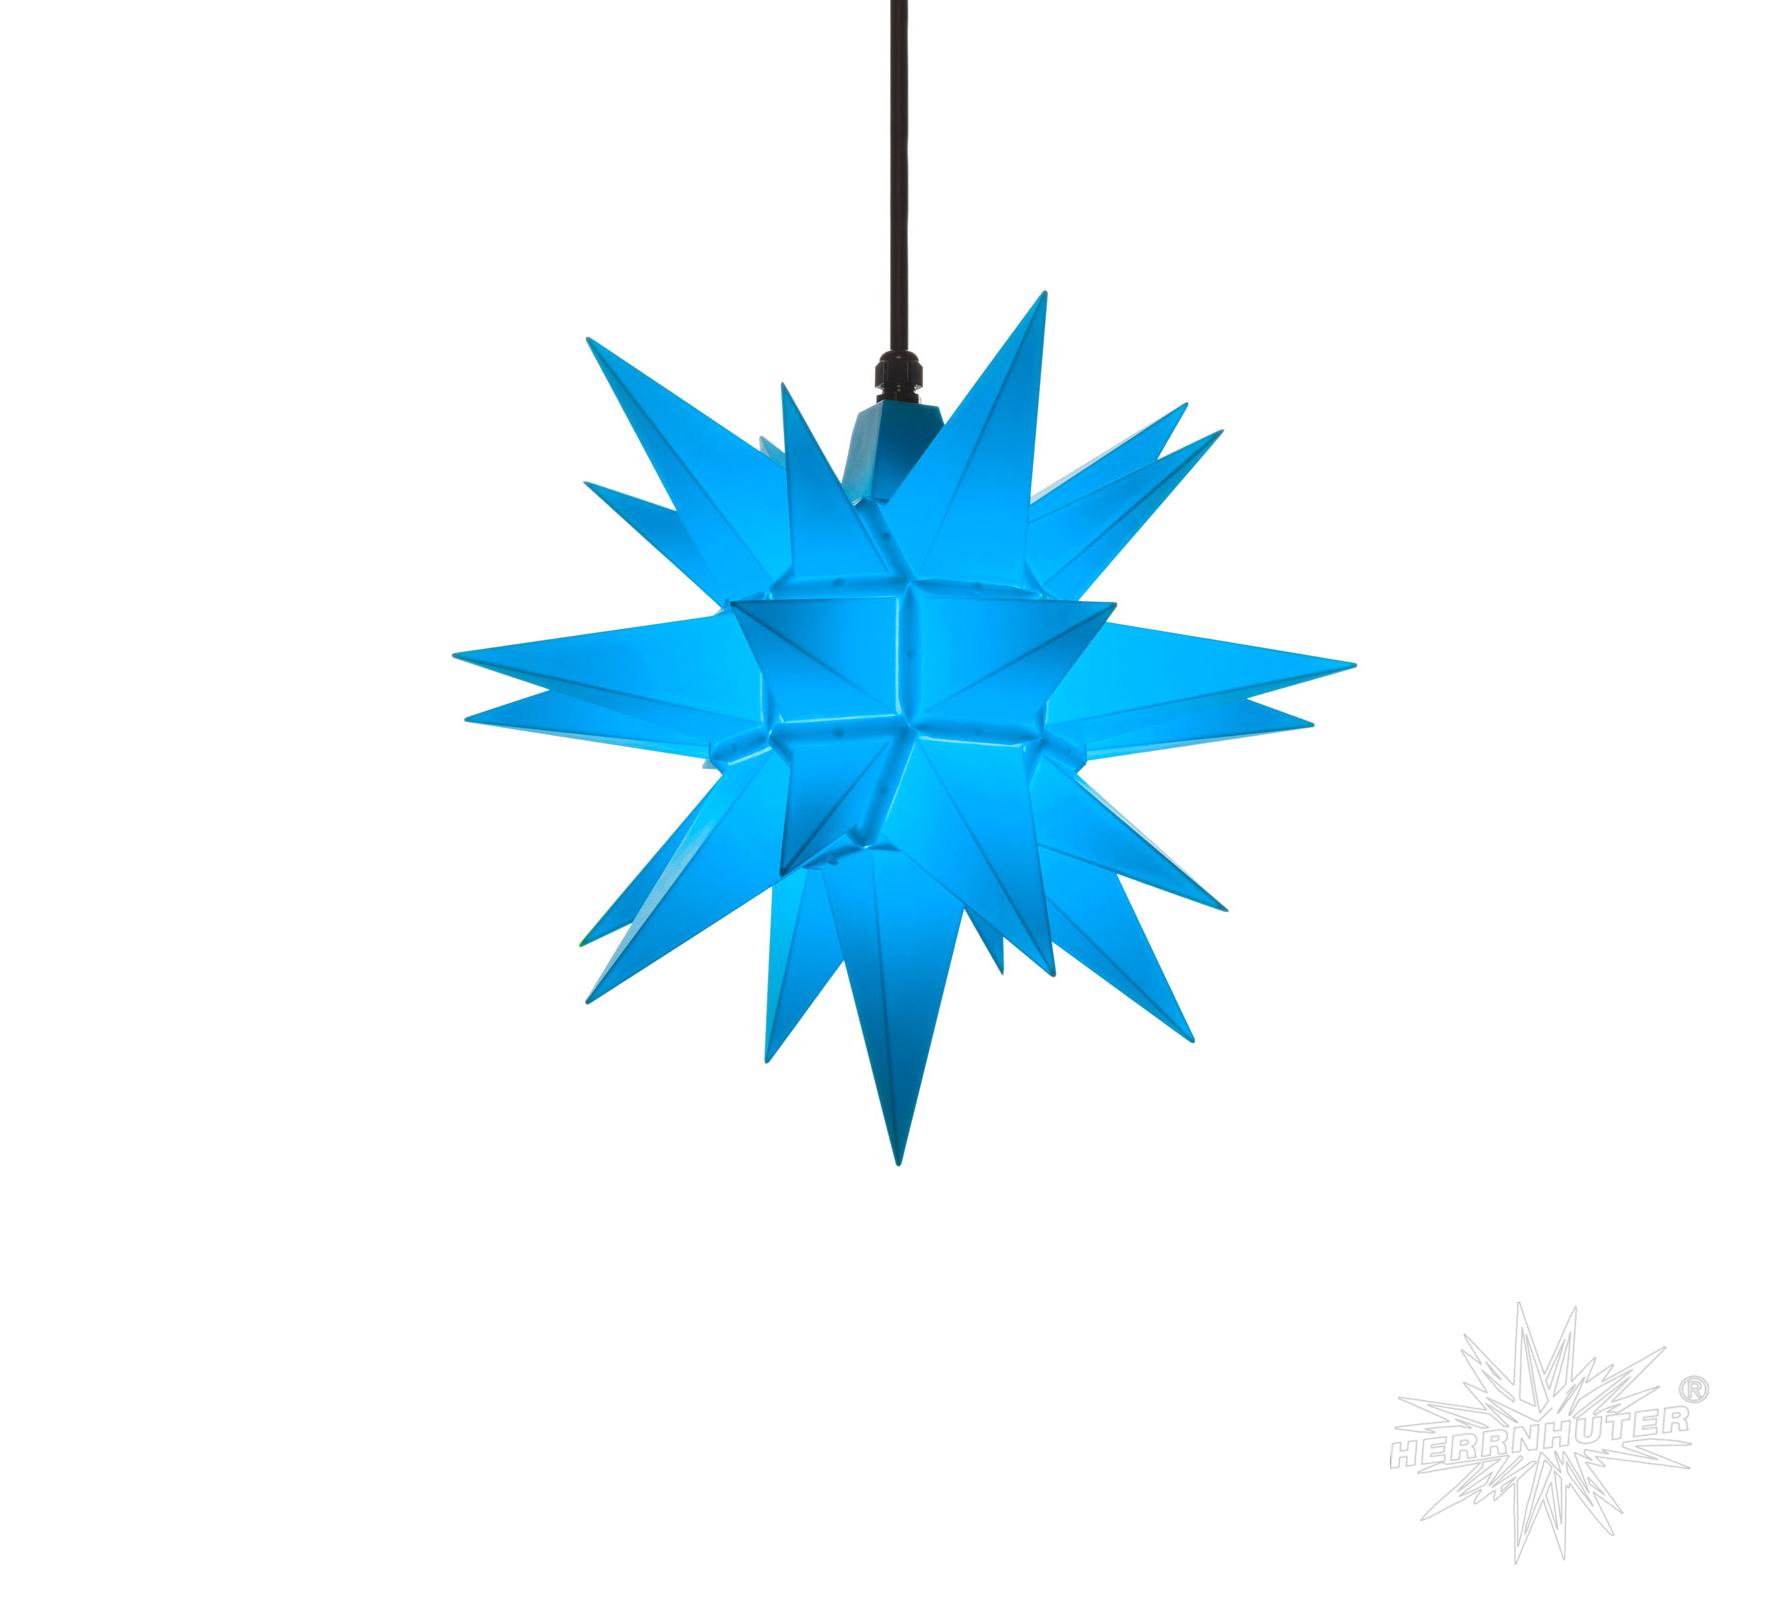 a4 blau kunststoff herrnhuter stern f r au en und innen. Black Bedroom Furniture Sets. Home Design Ideas